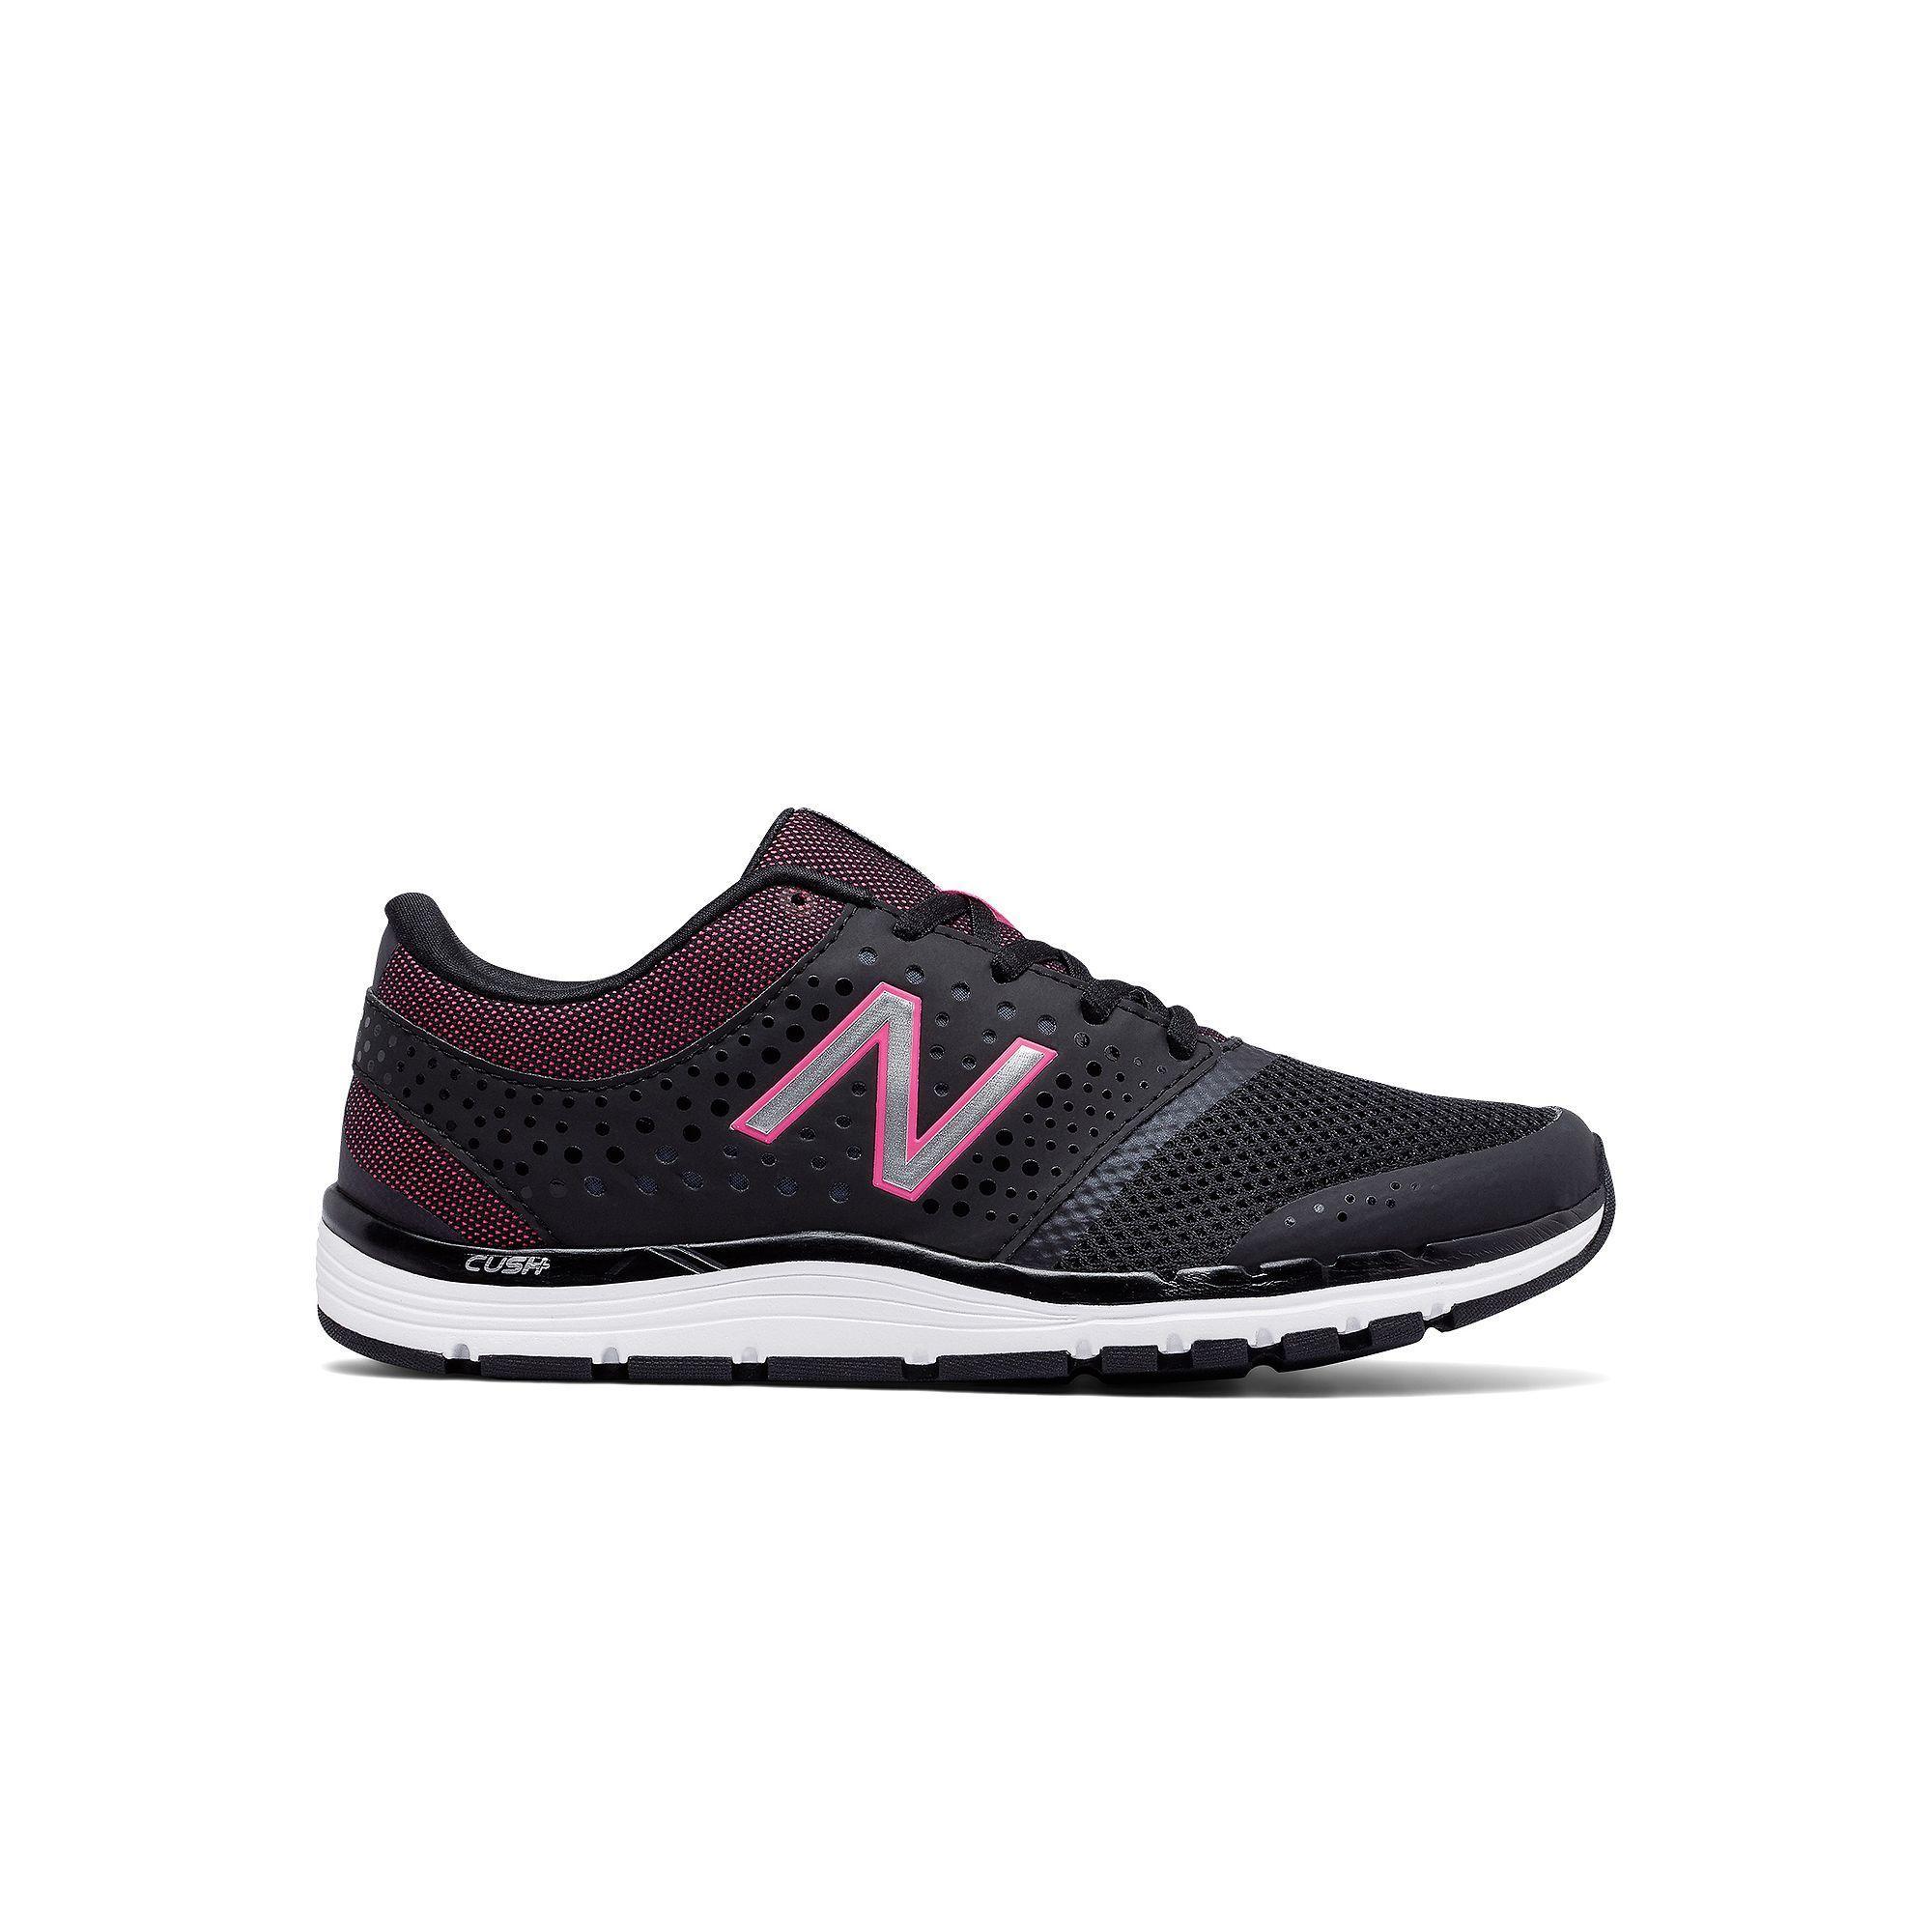 New Balance 577 v4 Trainer Cush+ Women's Running Shoes